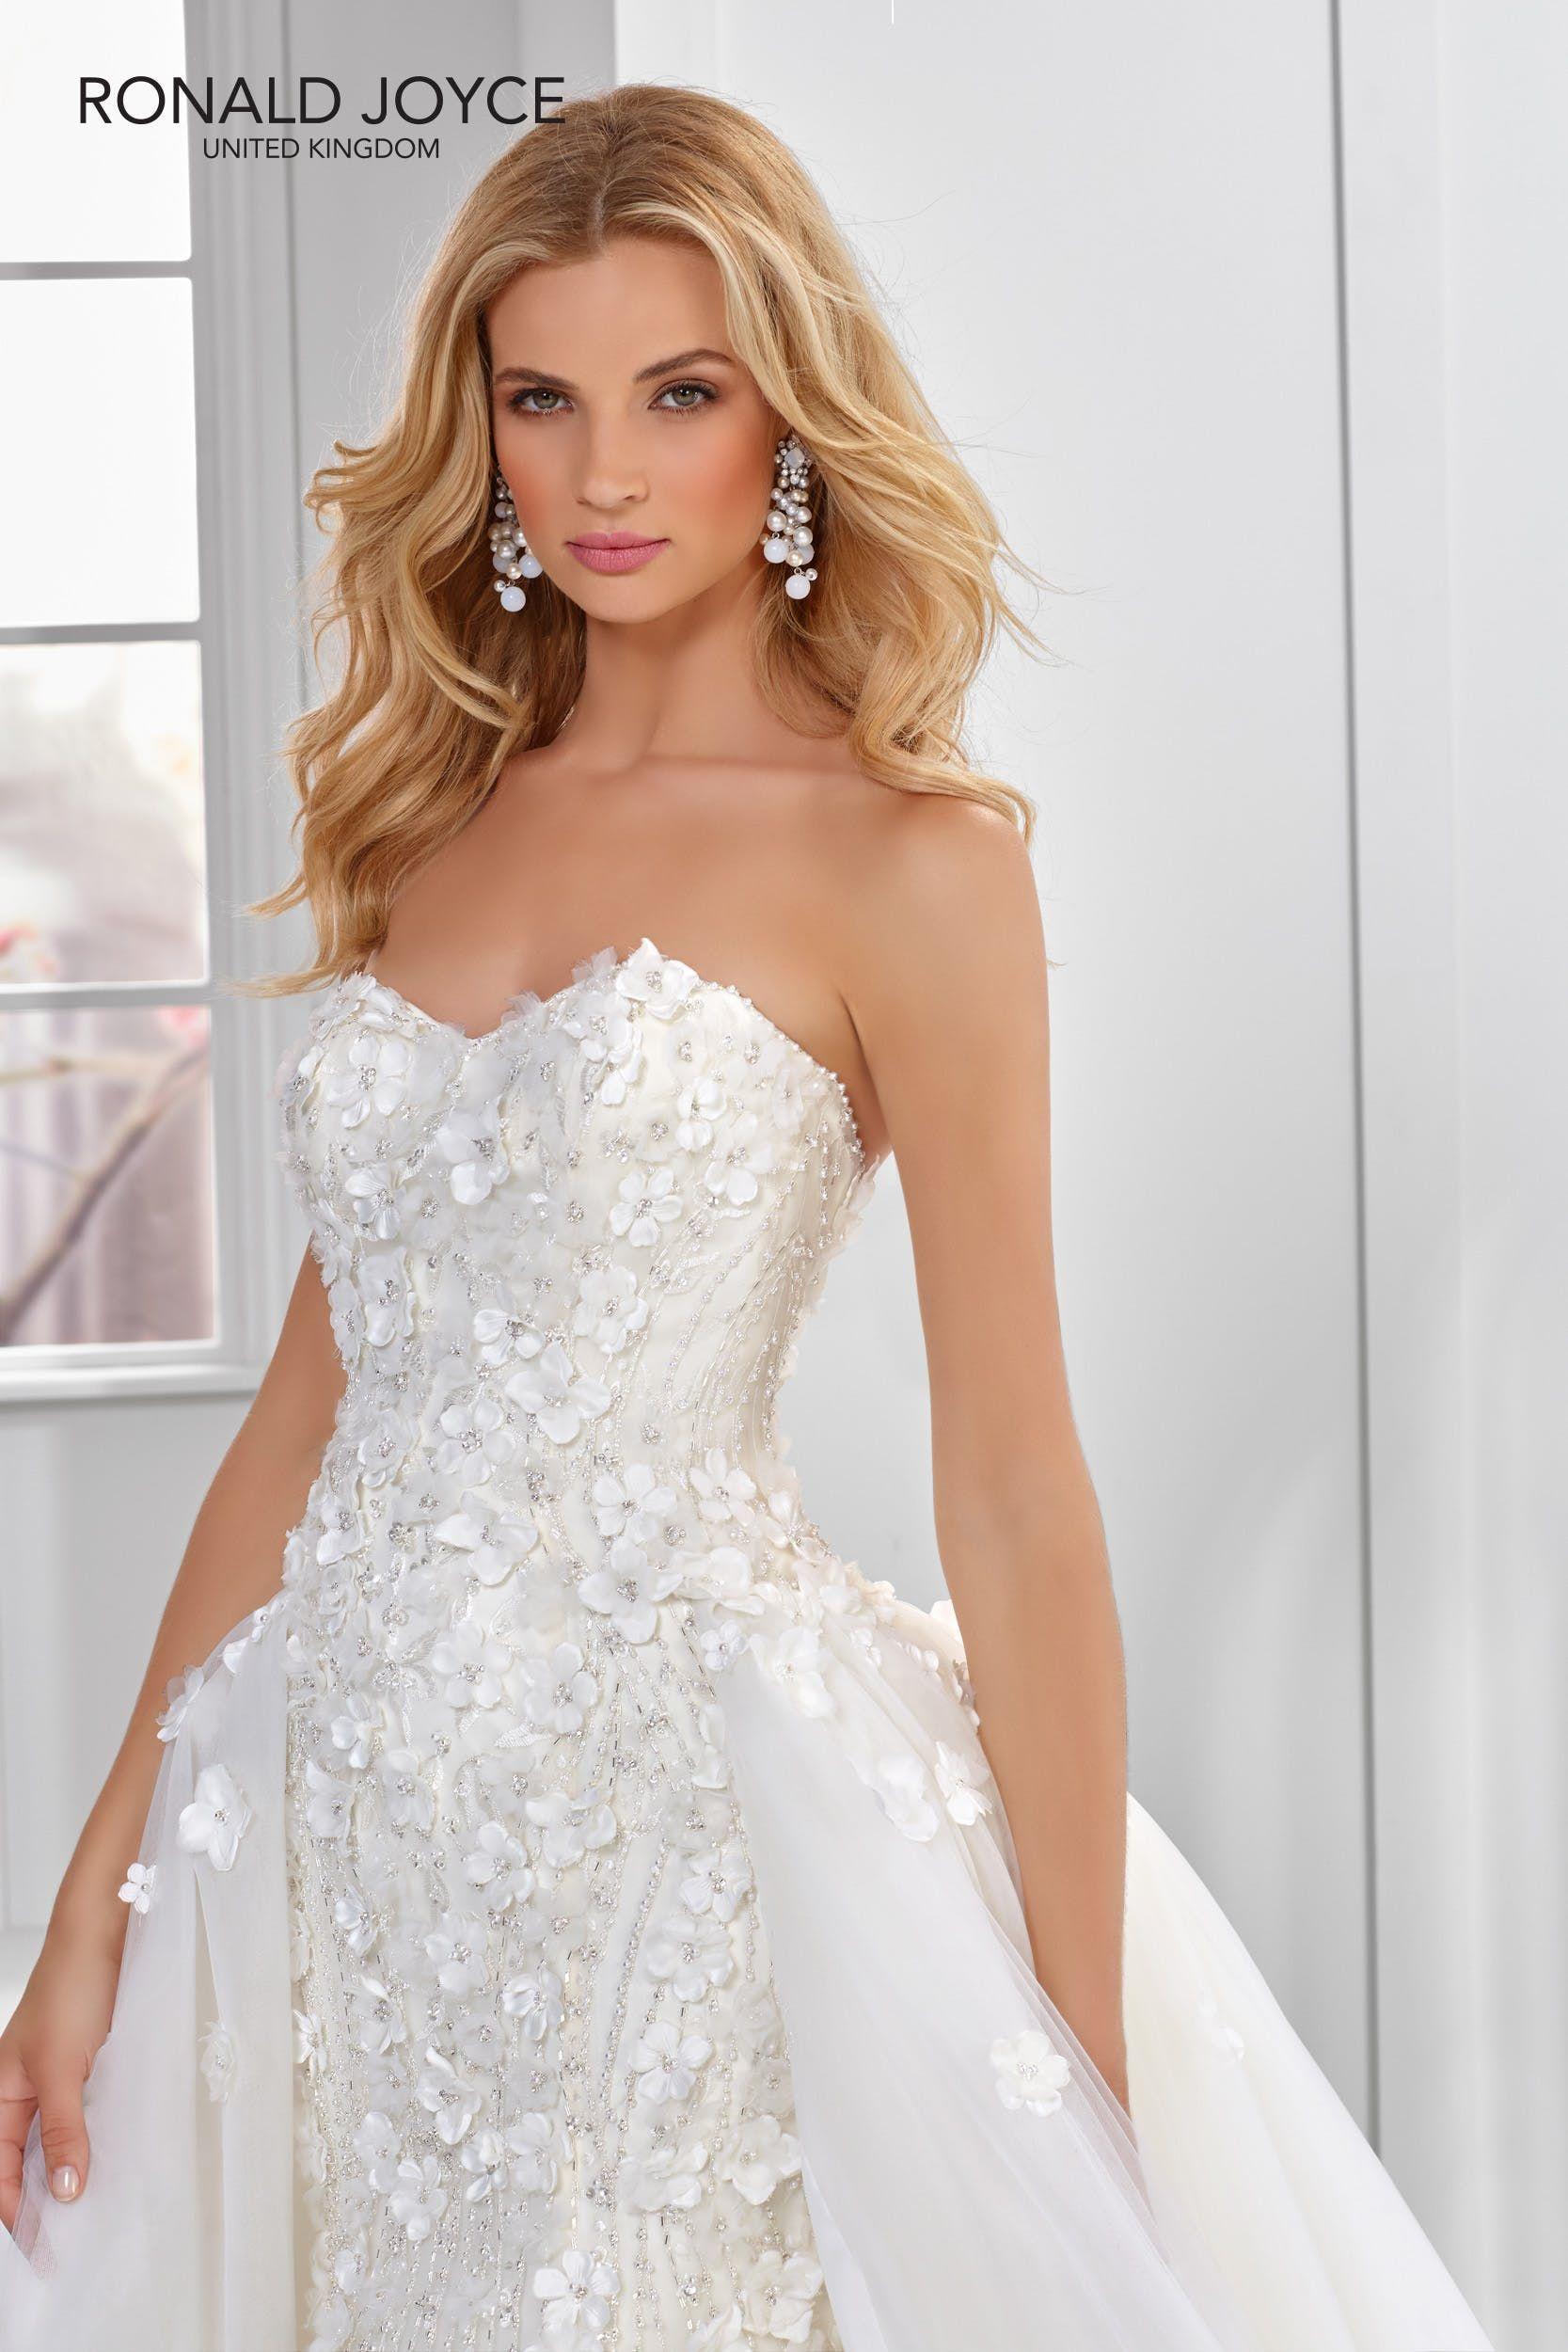 Ronald joyce wedding dress in pinterest ronald joyce